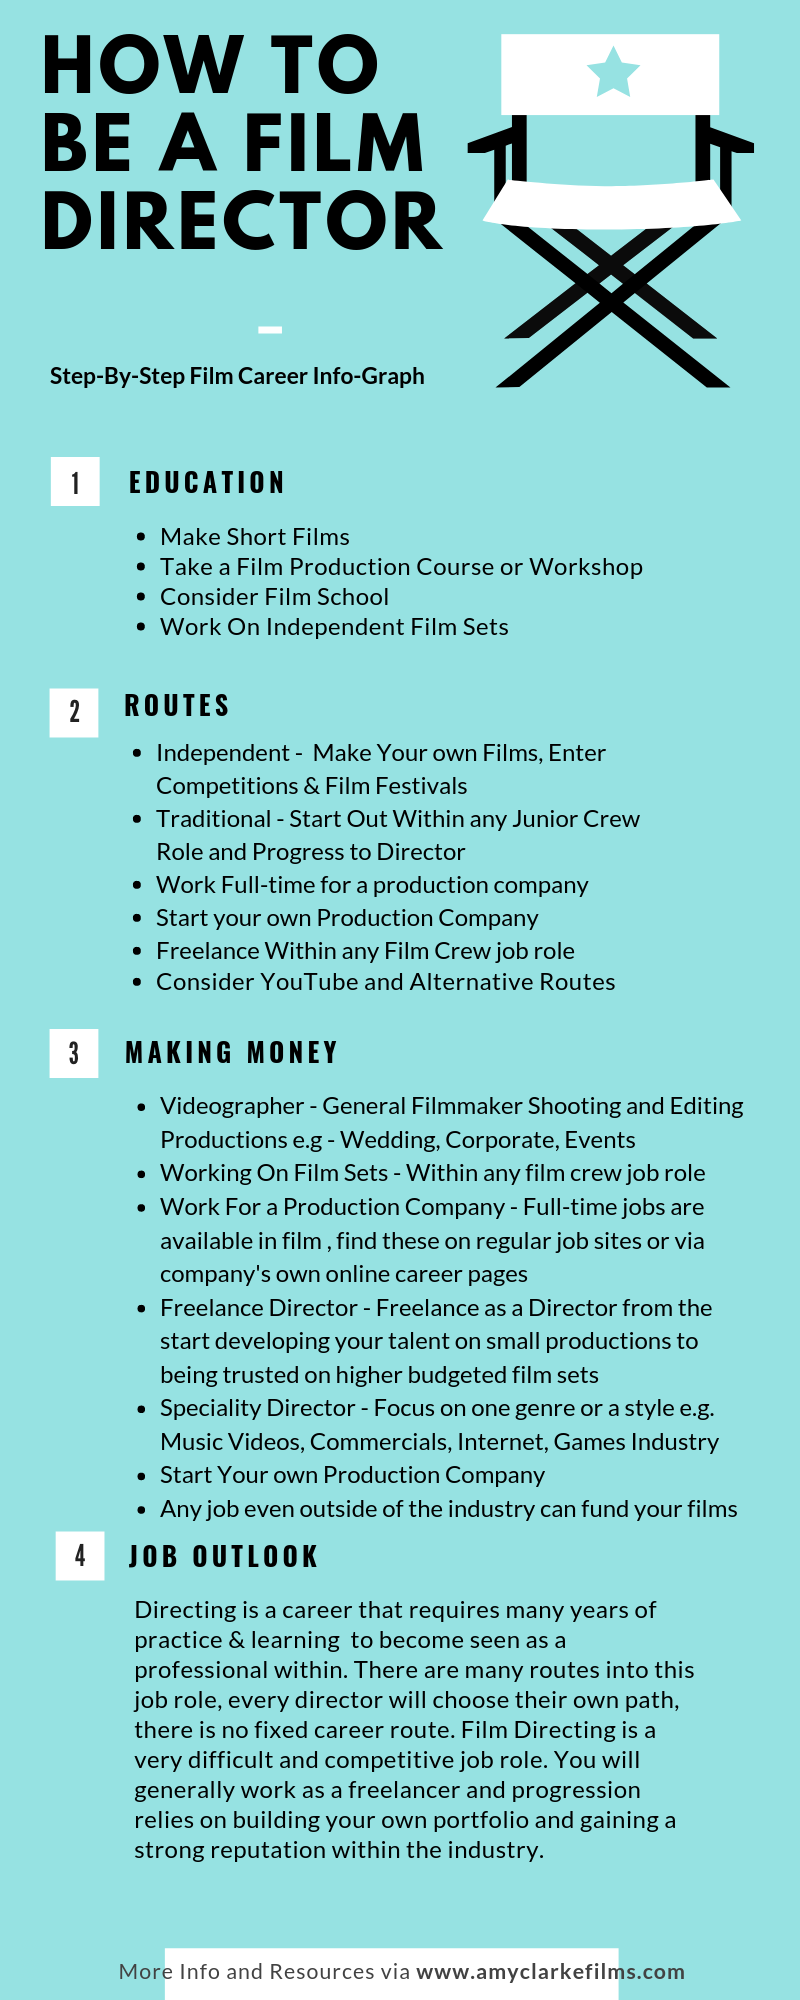 87068c99eaf3abd657e376193ef9e8c3 - How To Get A Job As A Film Director